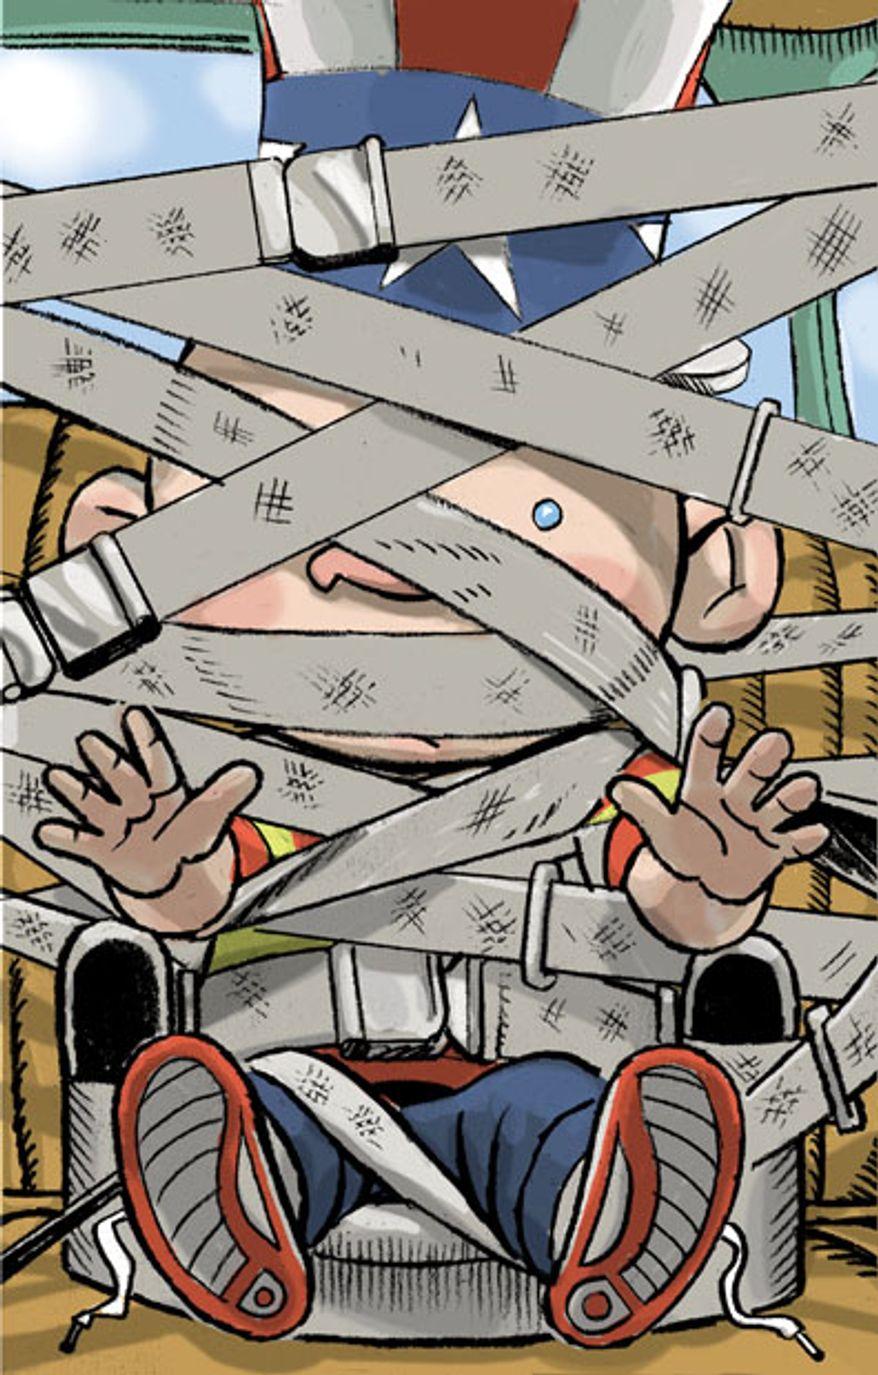 Illustration: Regulations by Alexander Hunter for The Washington Times